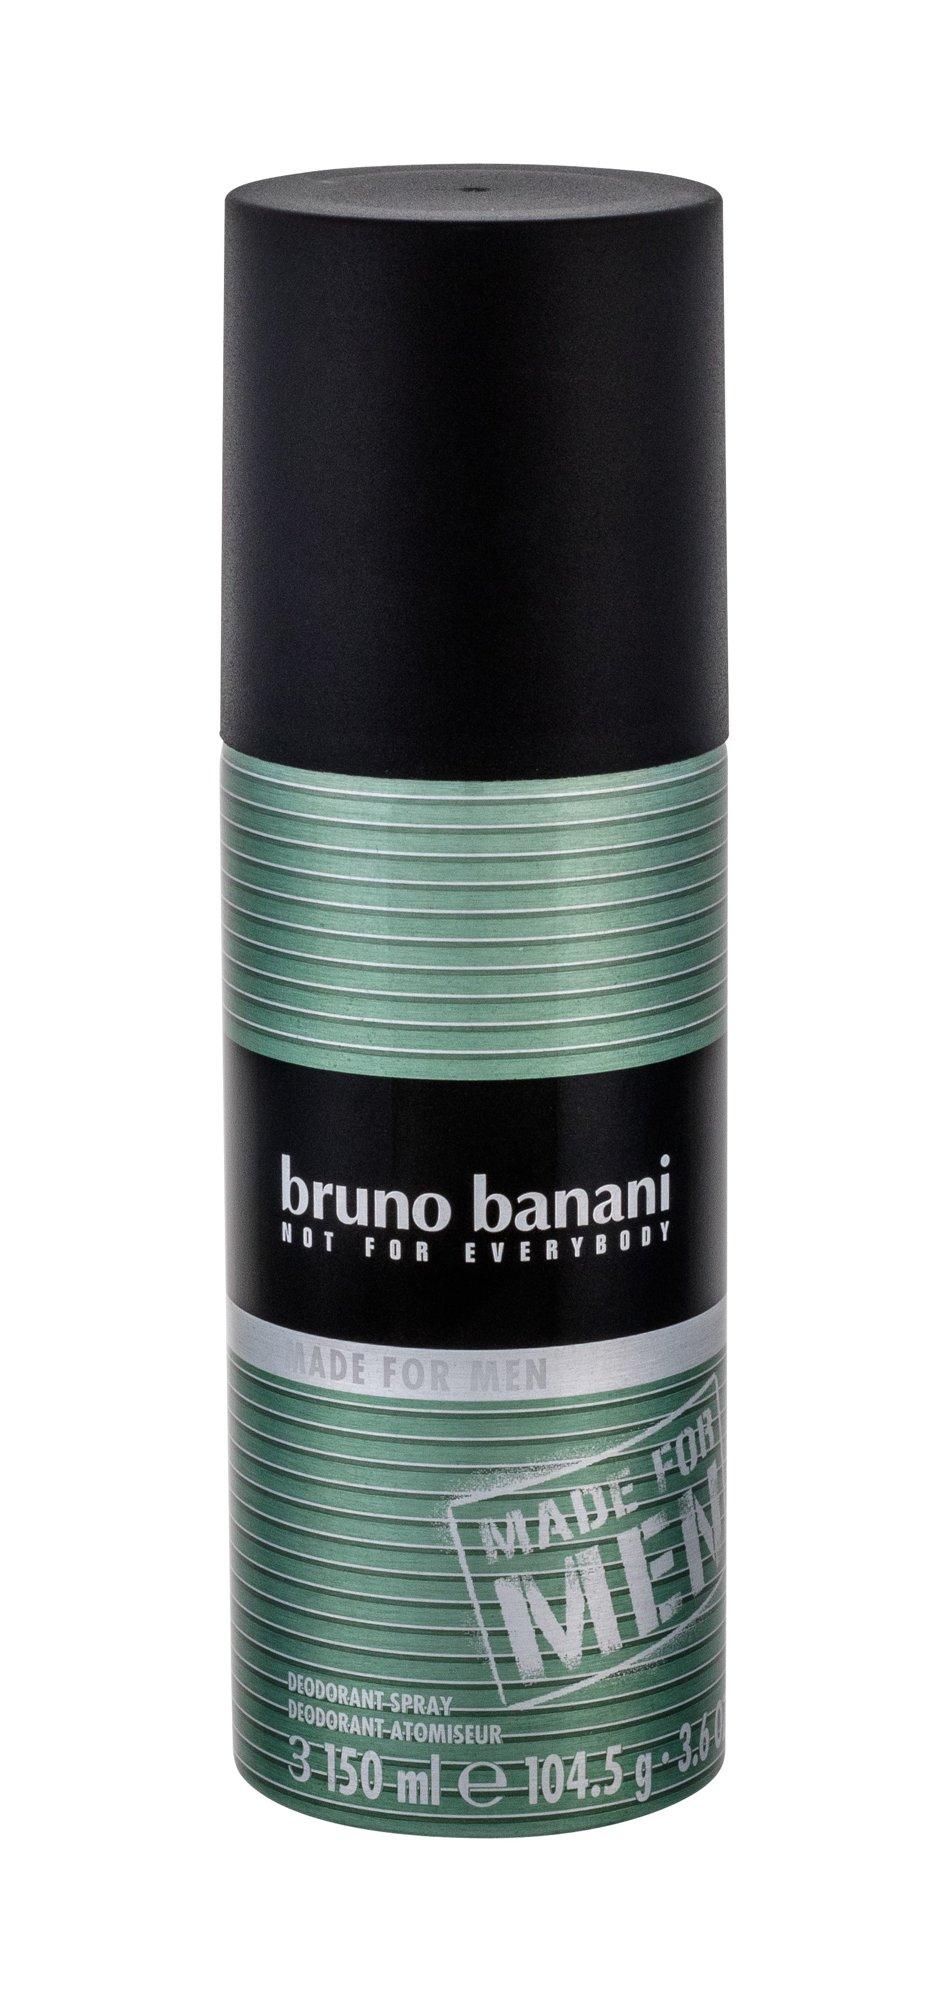 Dezodorantas Bruno Banani Made For Men